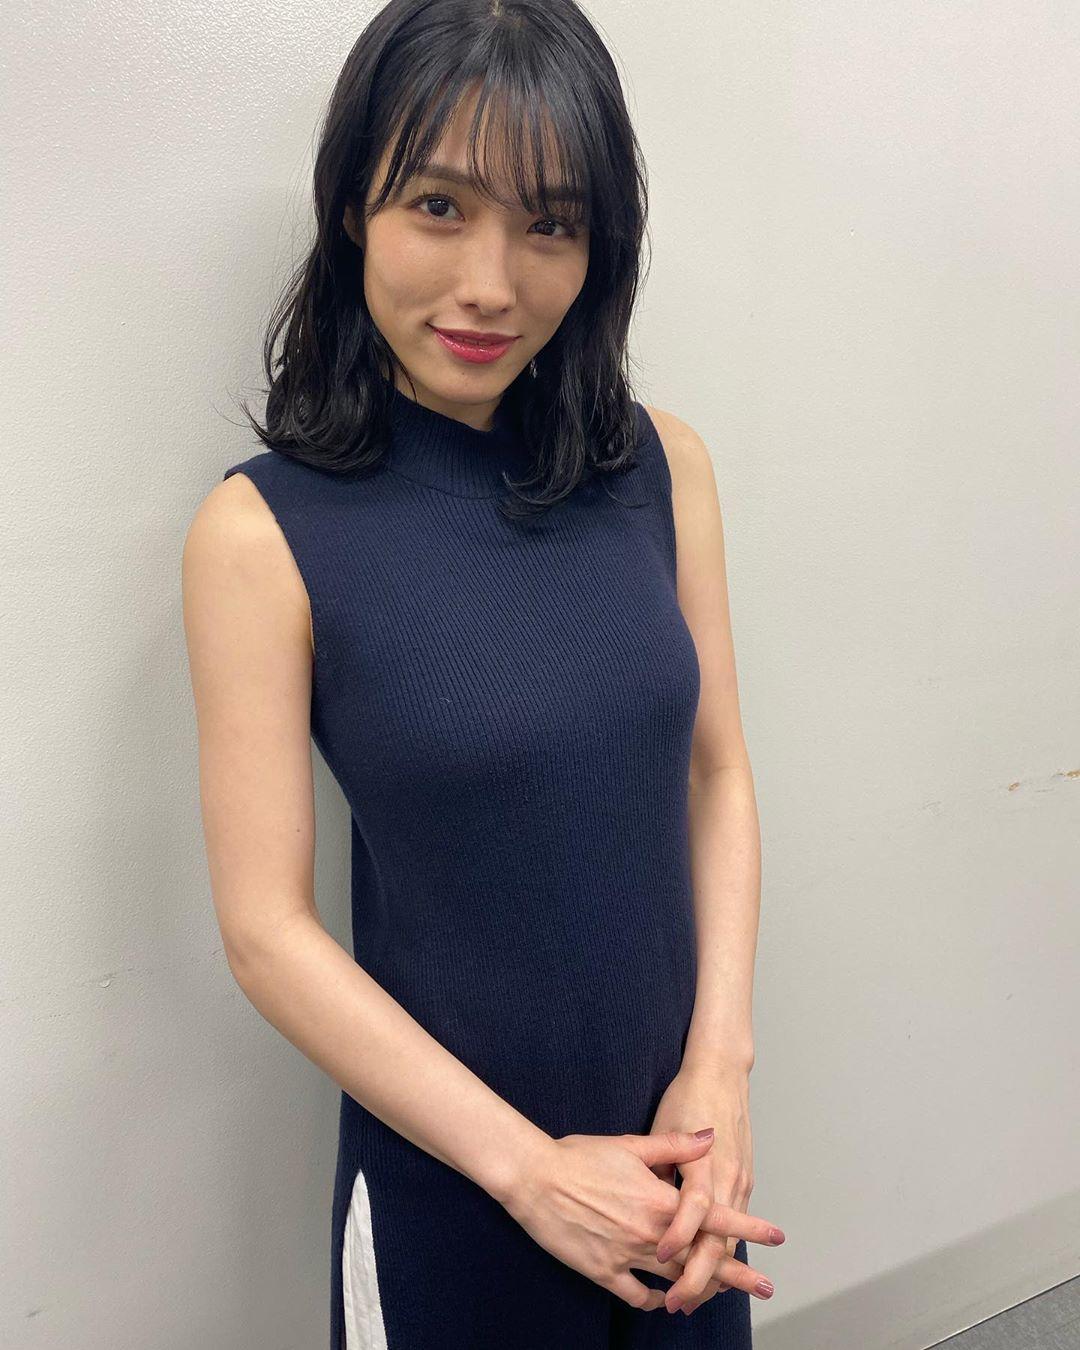 konno_anna182.jpg